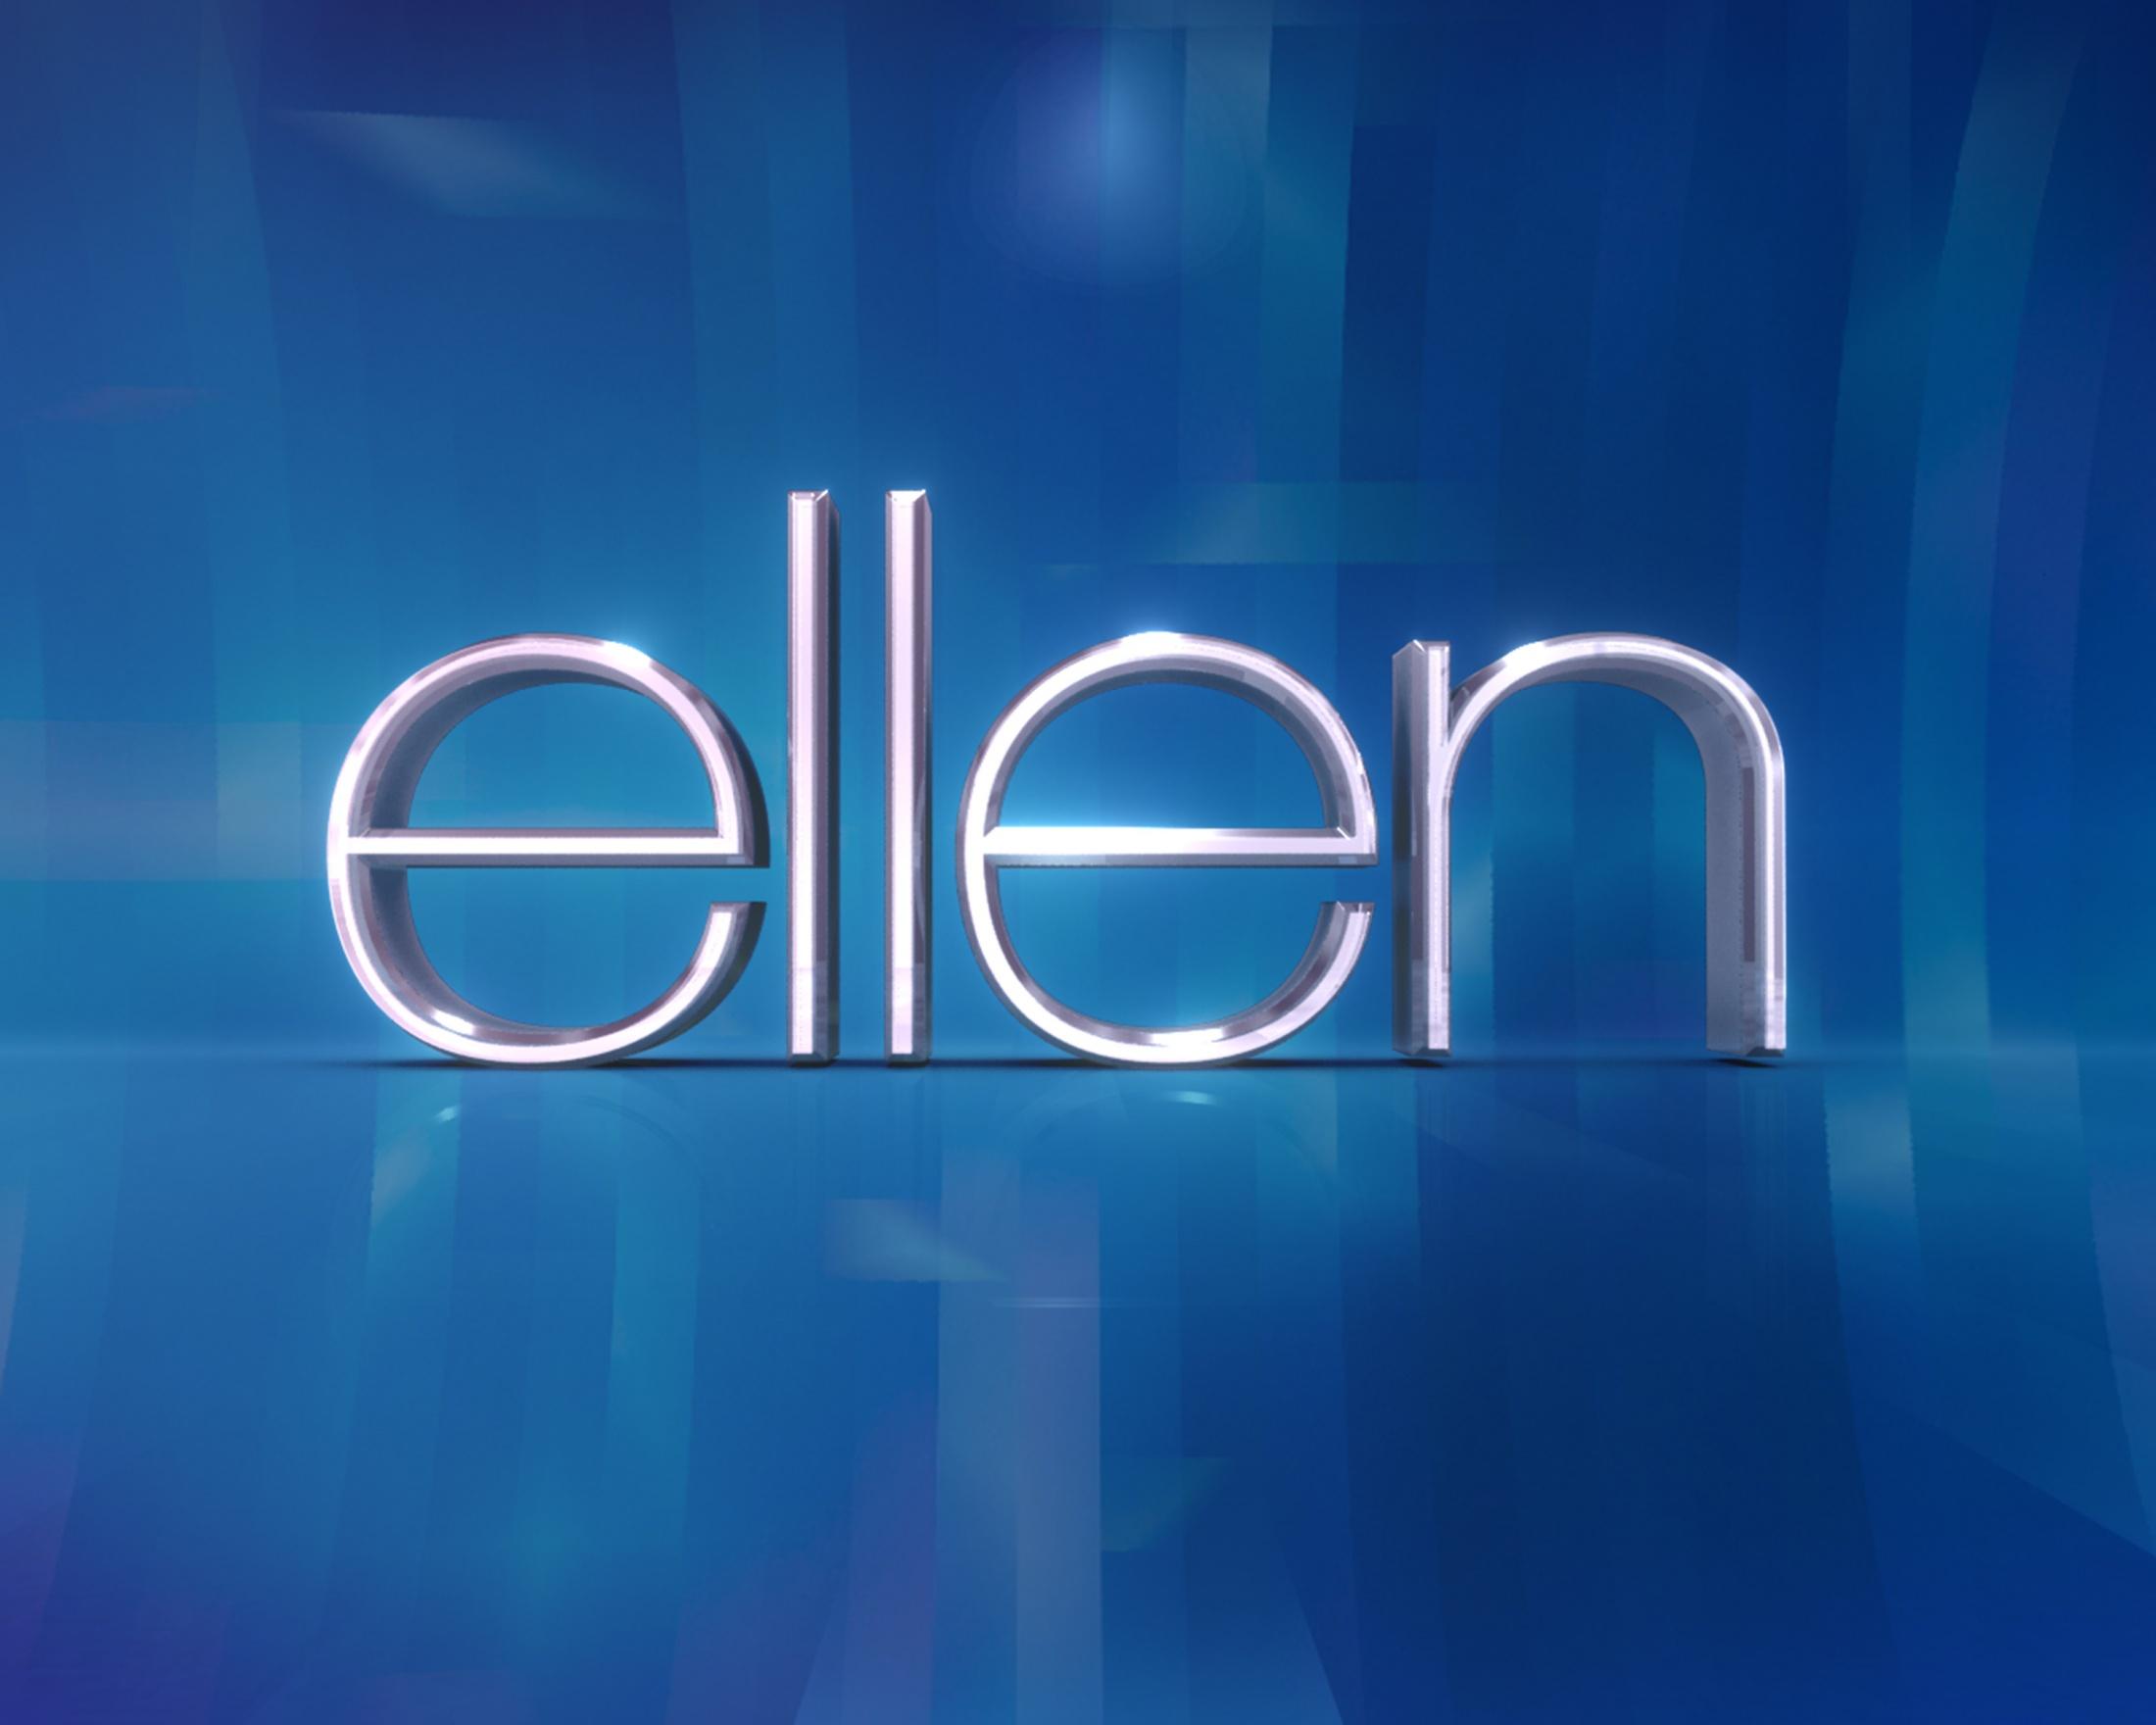 Thumbnail for The Ellen DeGeneres Show & GEICO